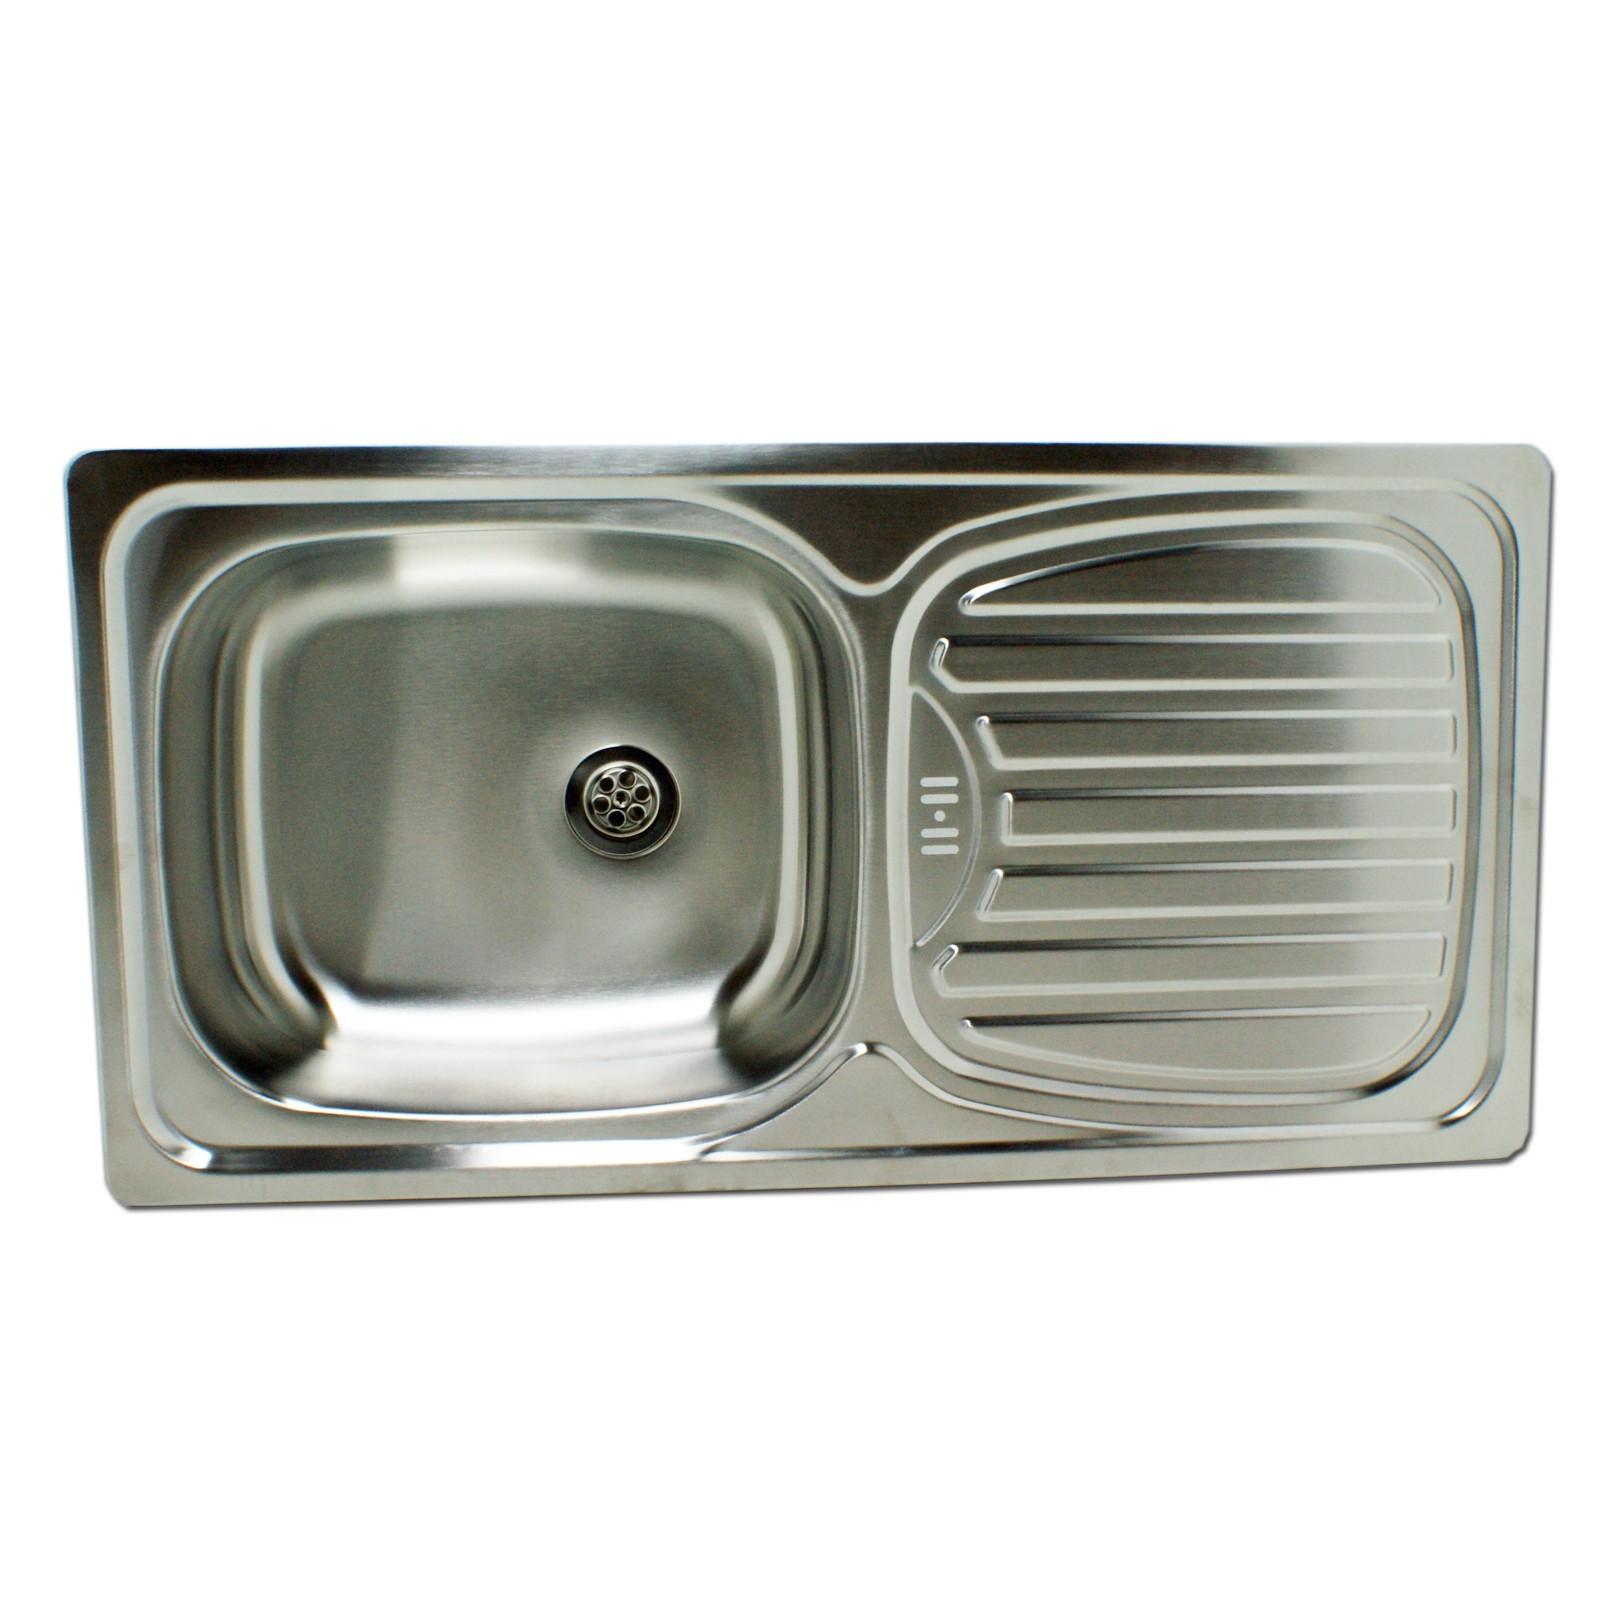 Edelstahl Einbauspüle Alfa1 Waschbecken Spüle Küchenspüle